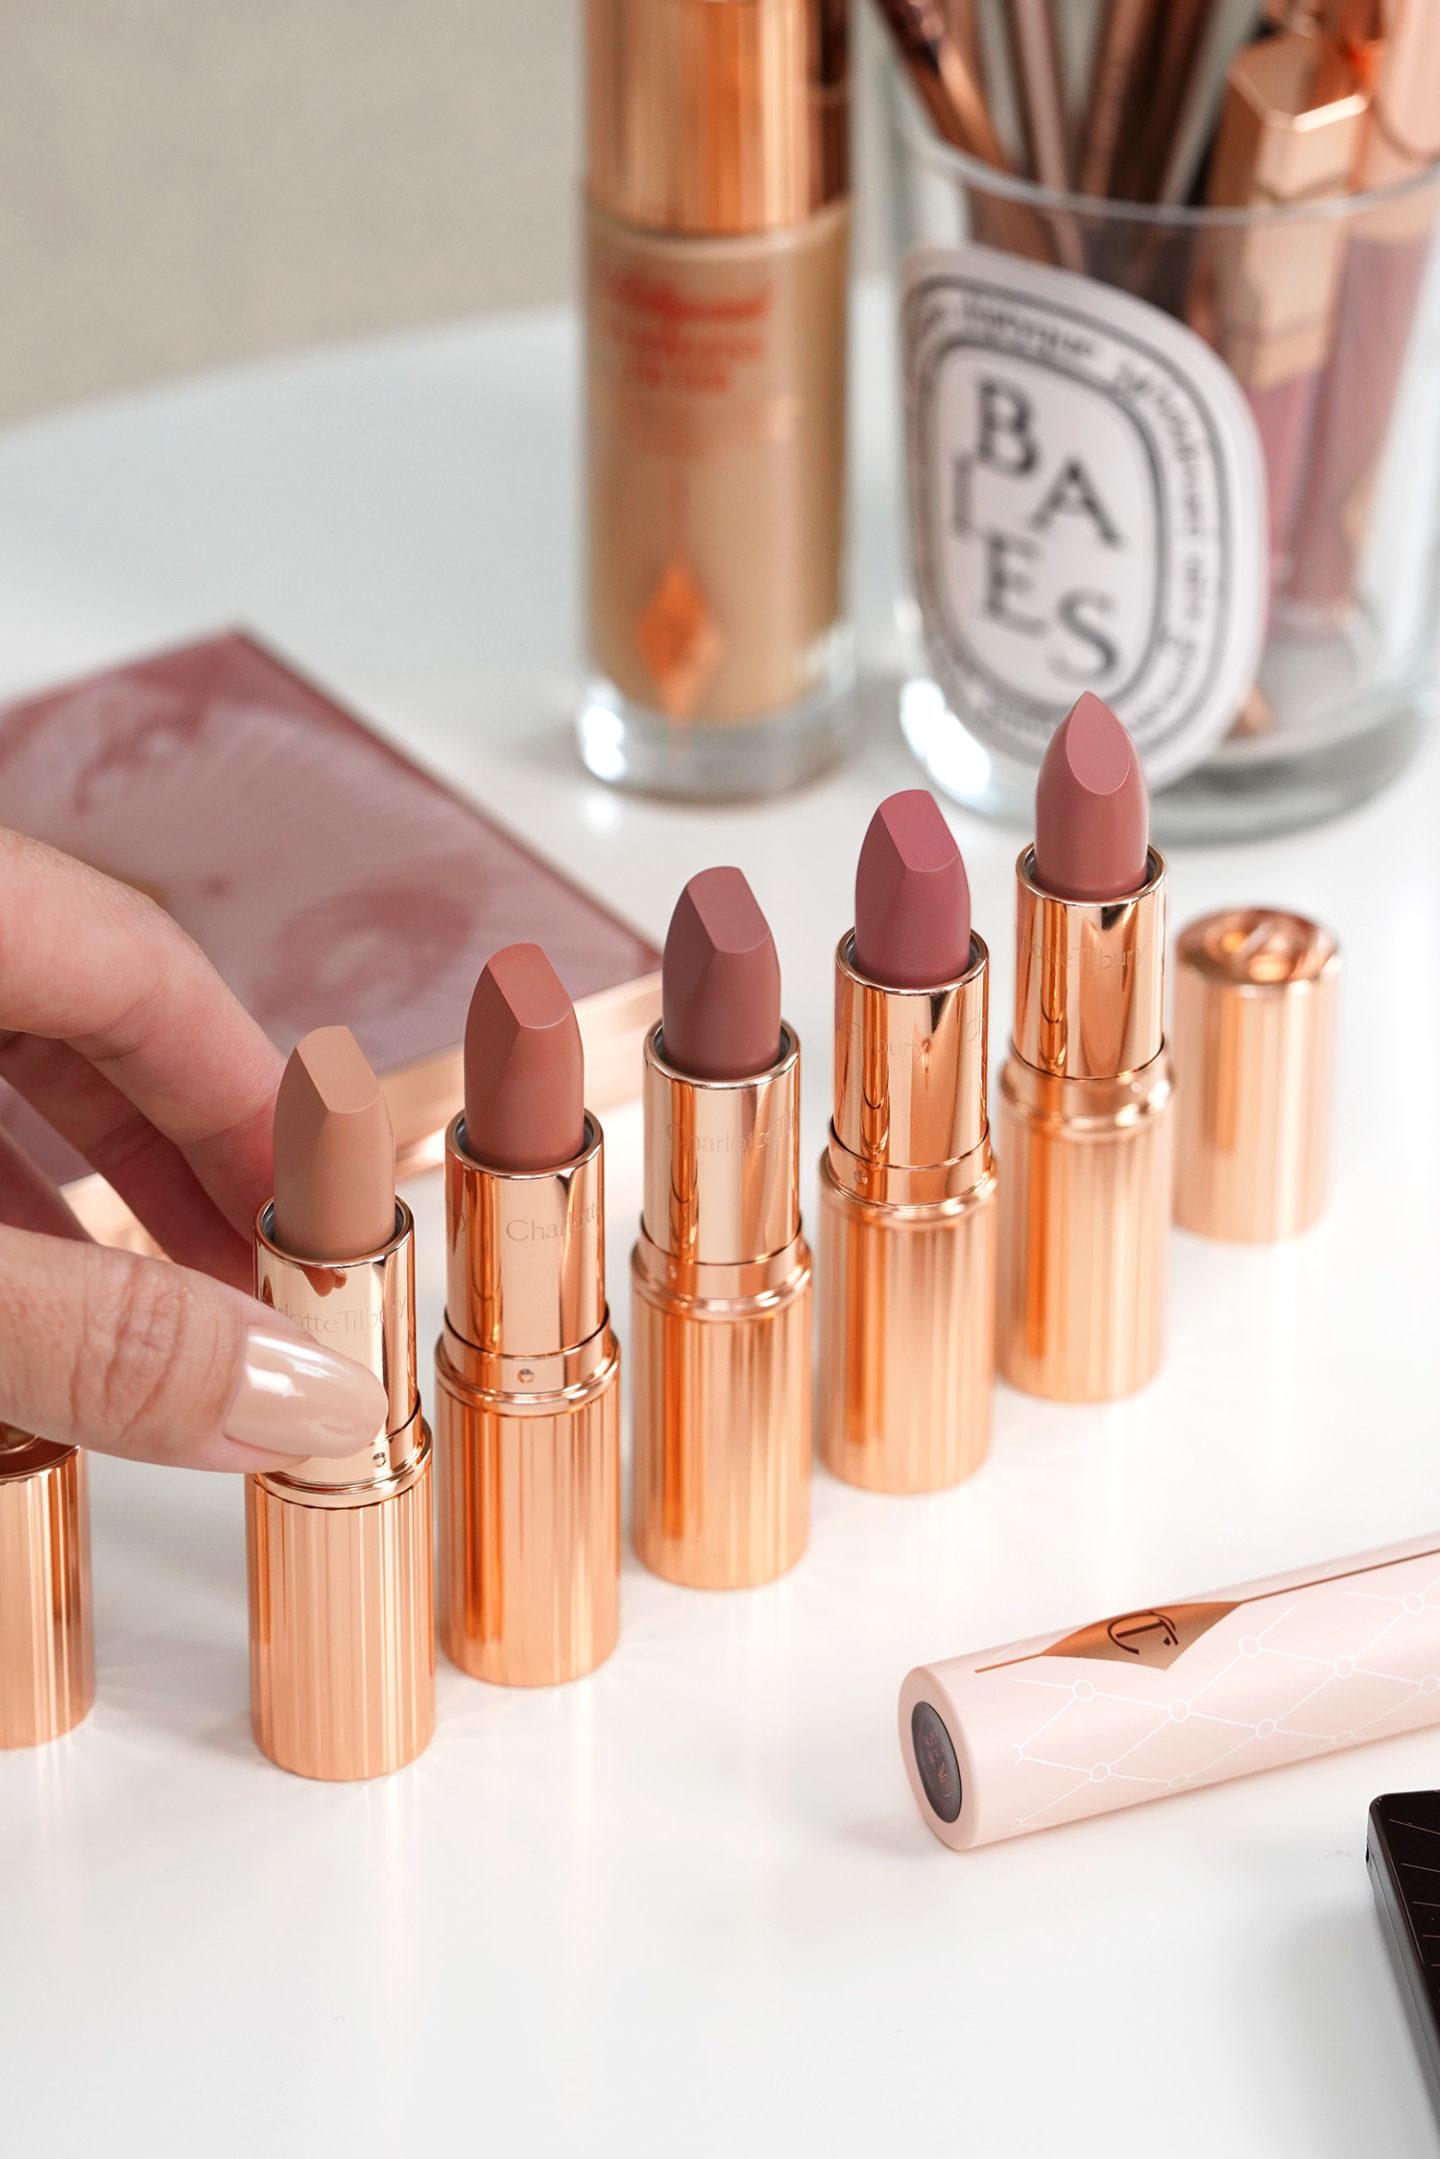 Charlotte Tilbury Super Nudes Lipsticks Cover Star, Catwalking, Super Fabulous, Top Model, Runway Royalty